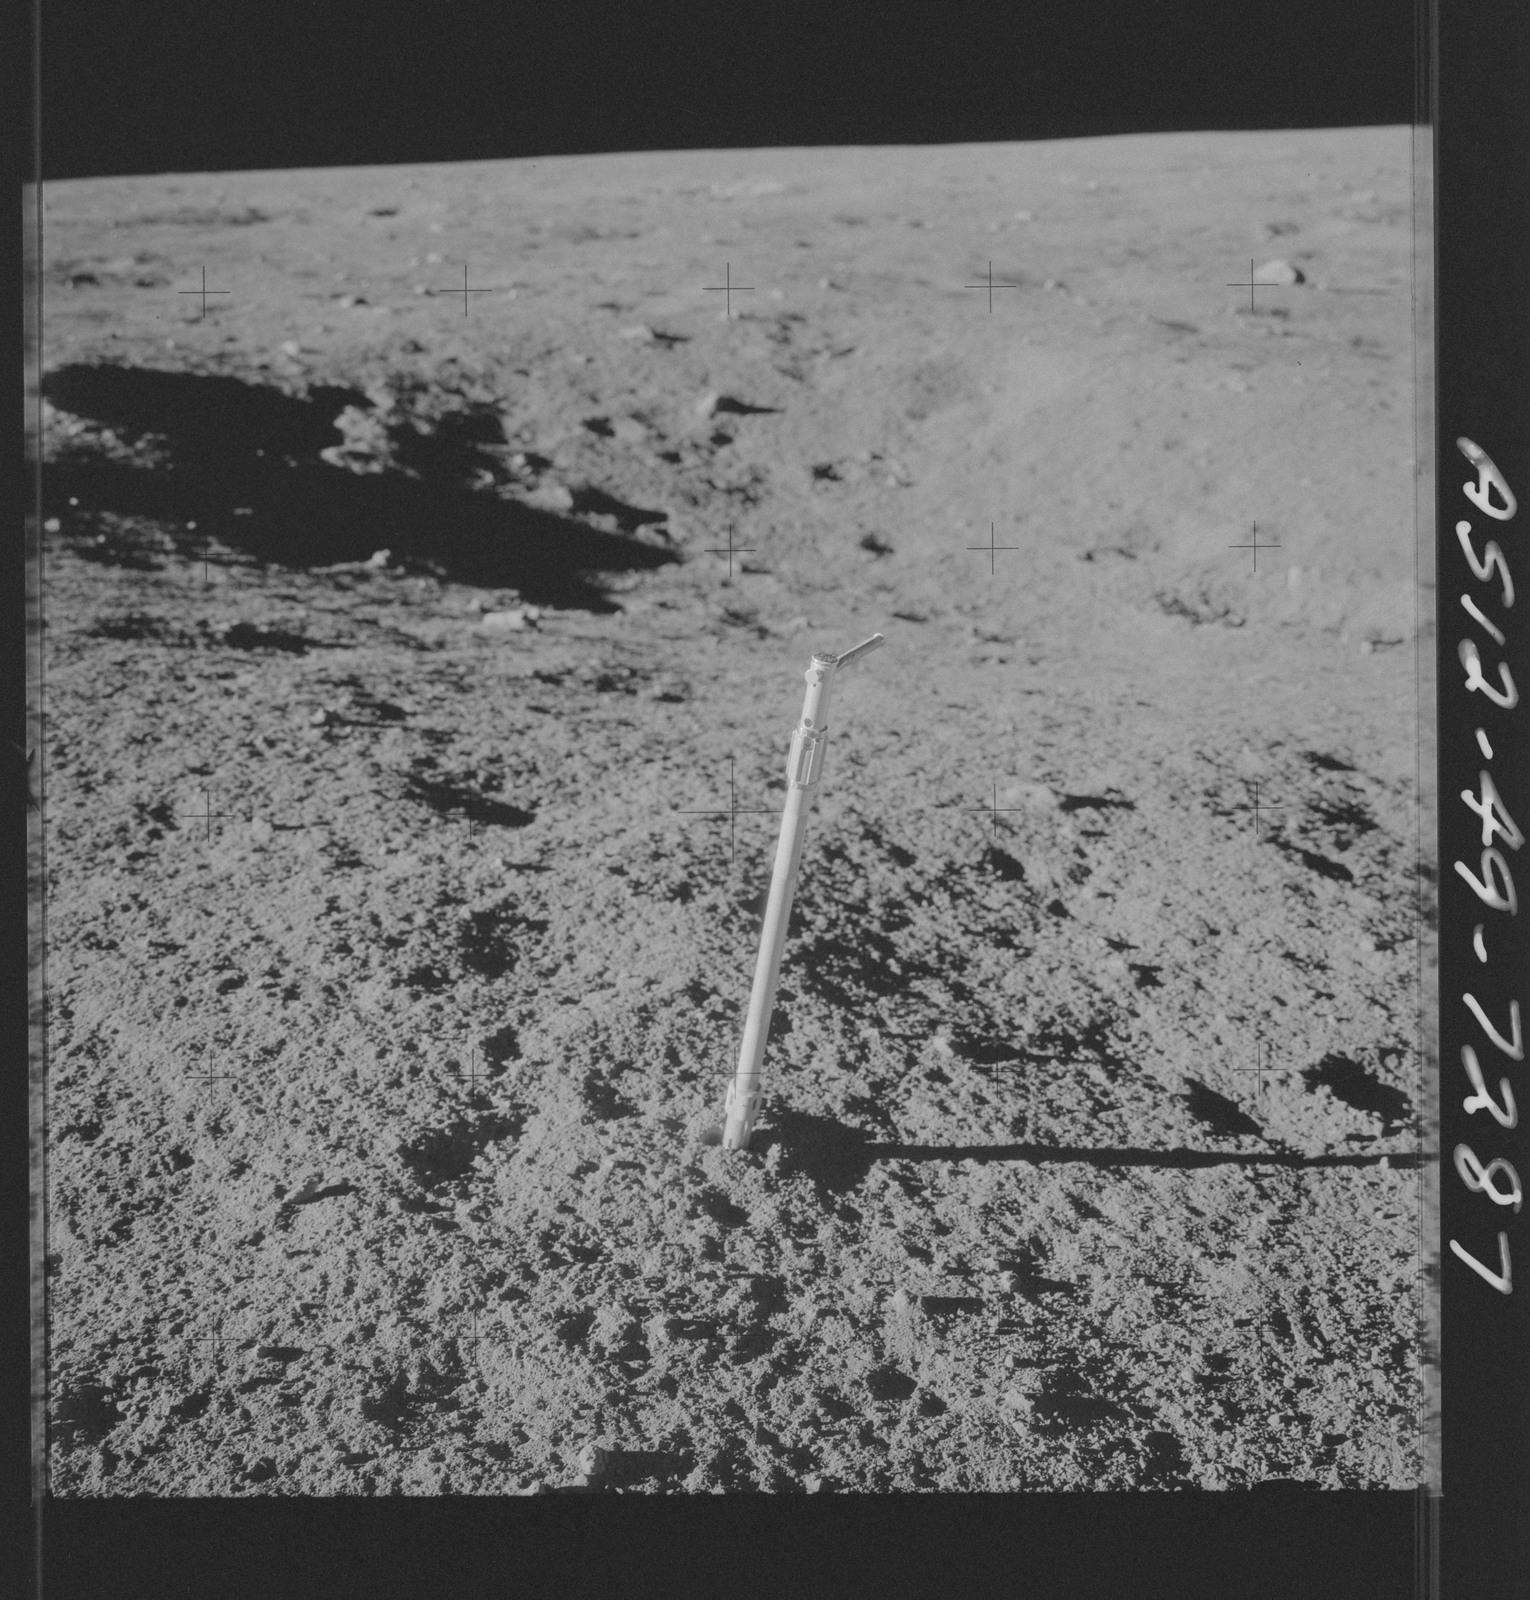 AS12-49-7287 - Apollo 12 - Apollo 12 Mission image  - View of a Core Sampler near Halo Crater